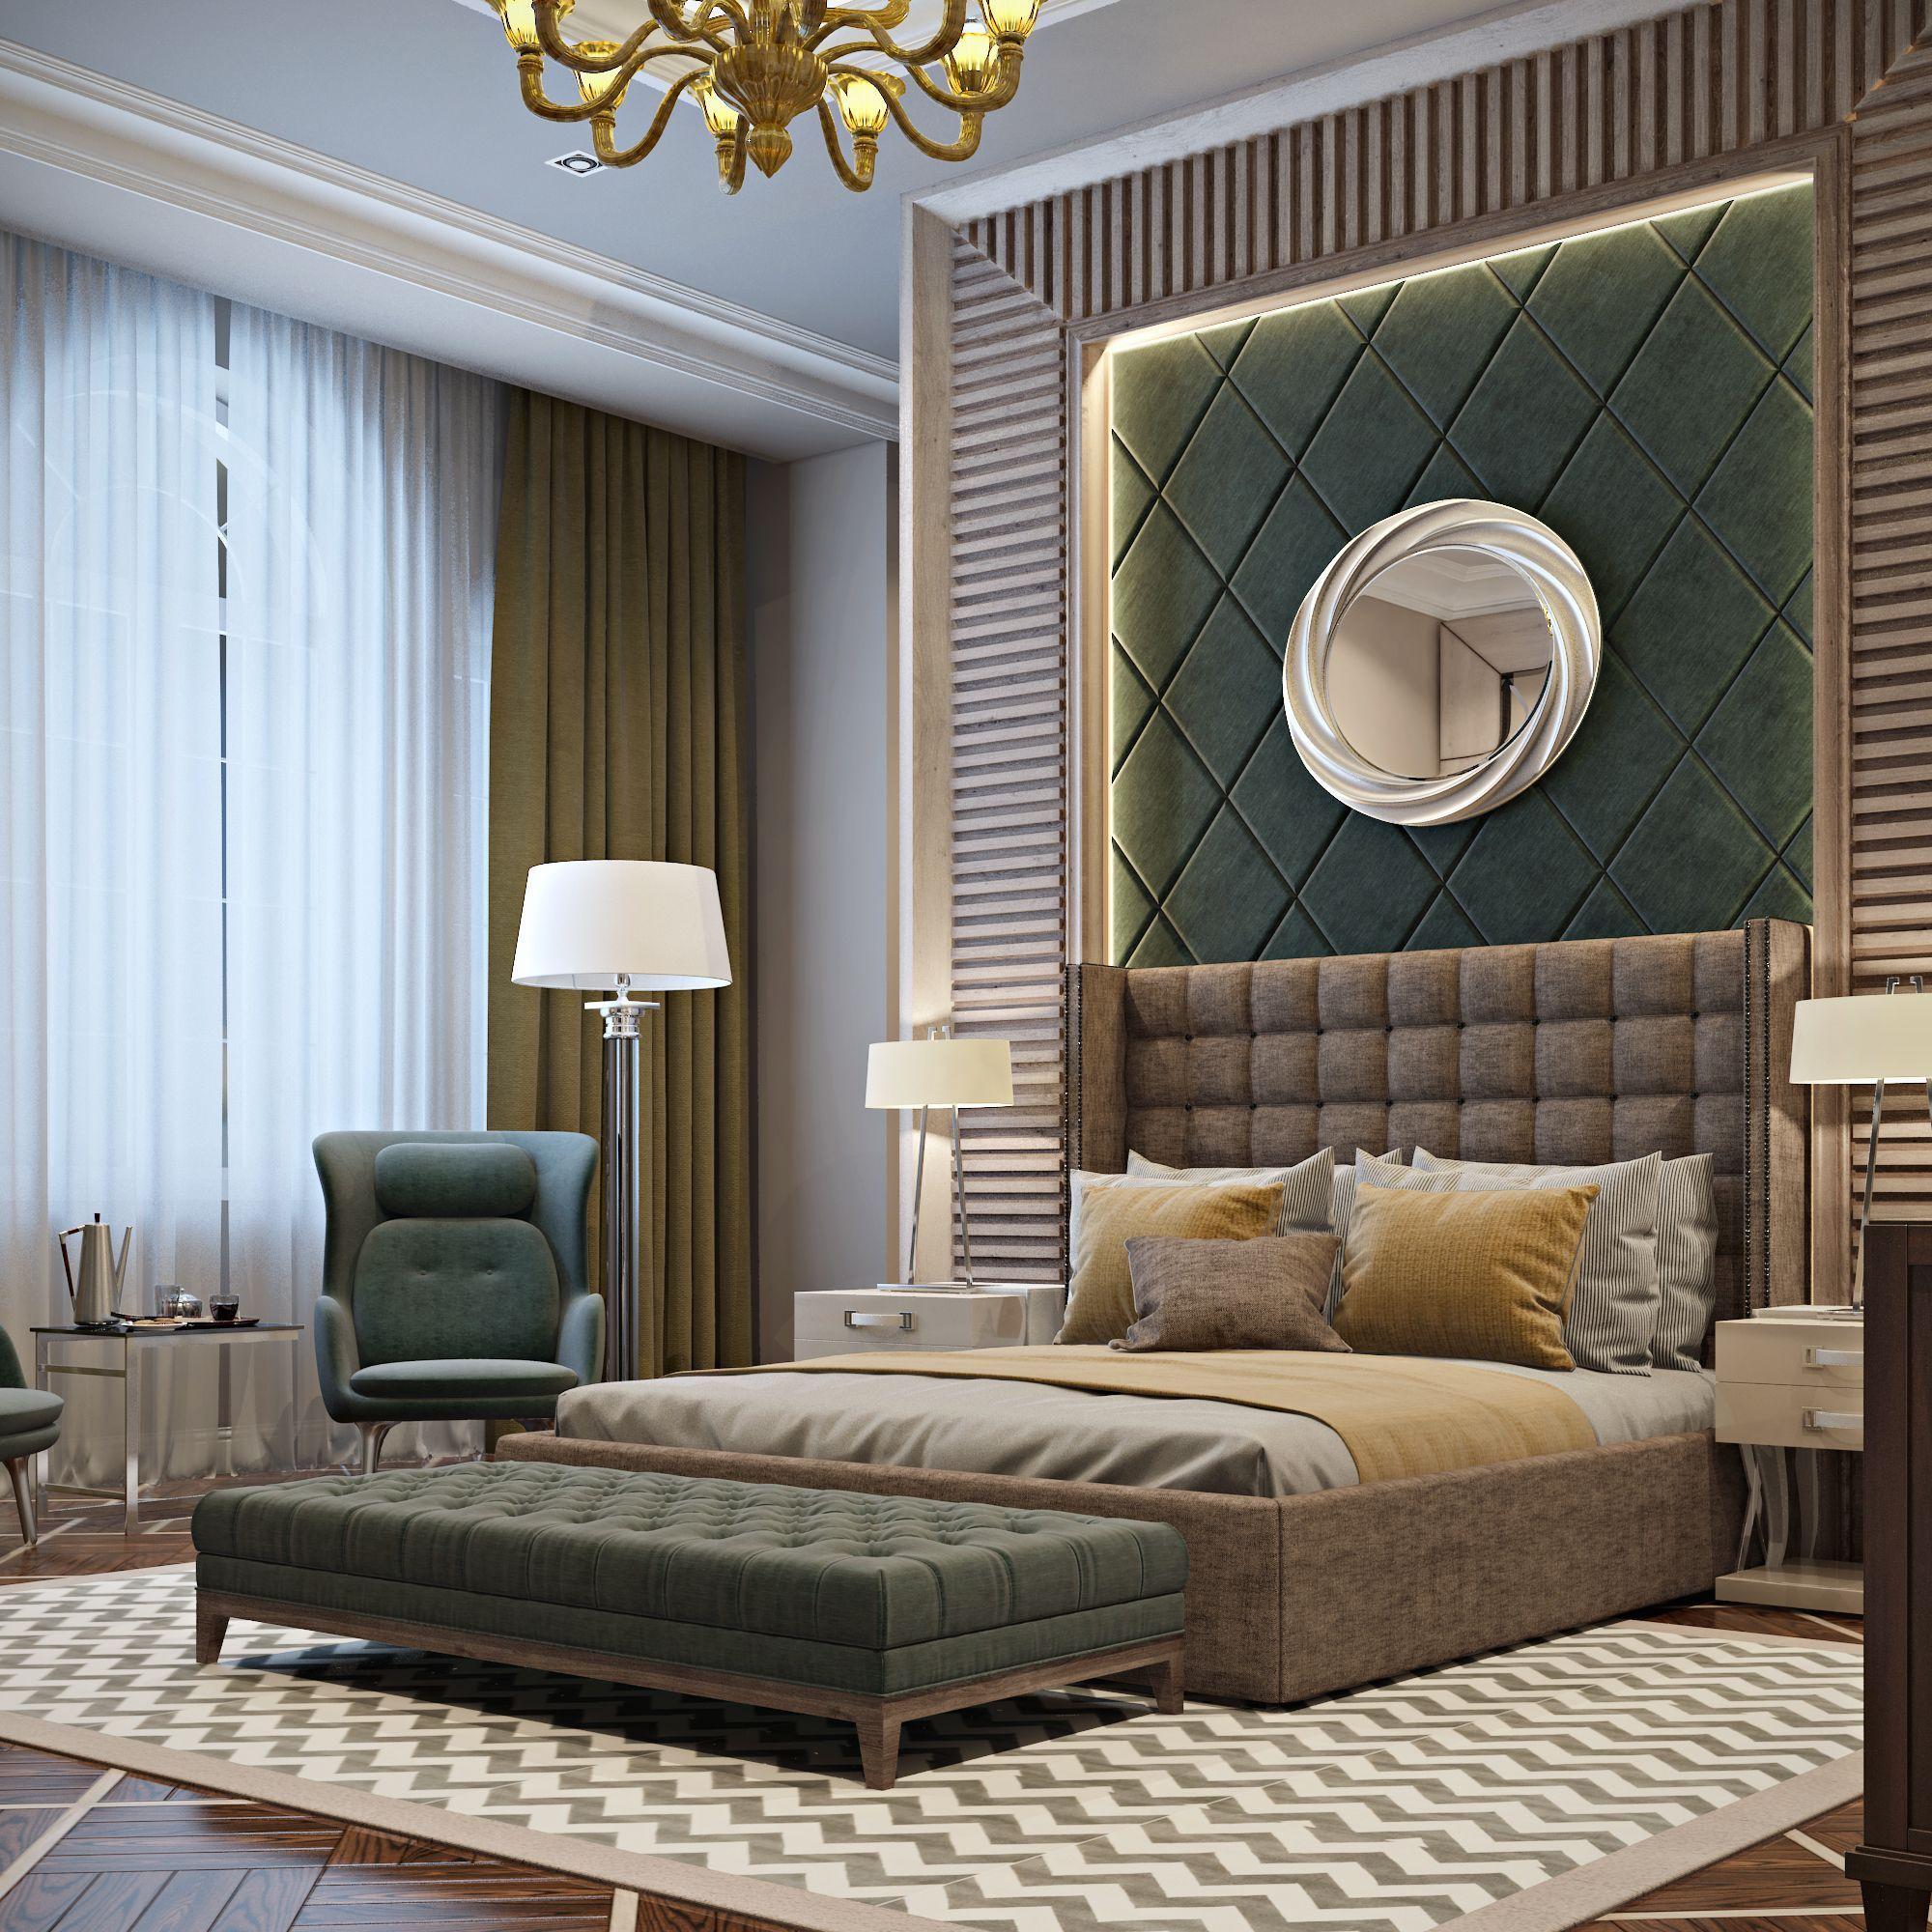 How To Get The Perfect Modern Classic Bedroom Luxuryclassicbedrooms Modern Classic Bedroom Luxurious Bedrooms Bedroom Bed Design